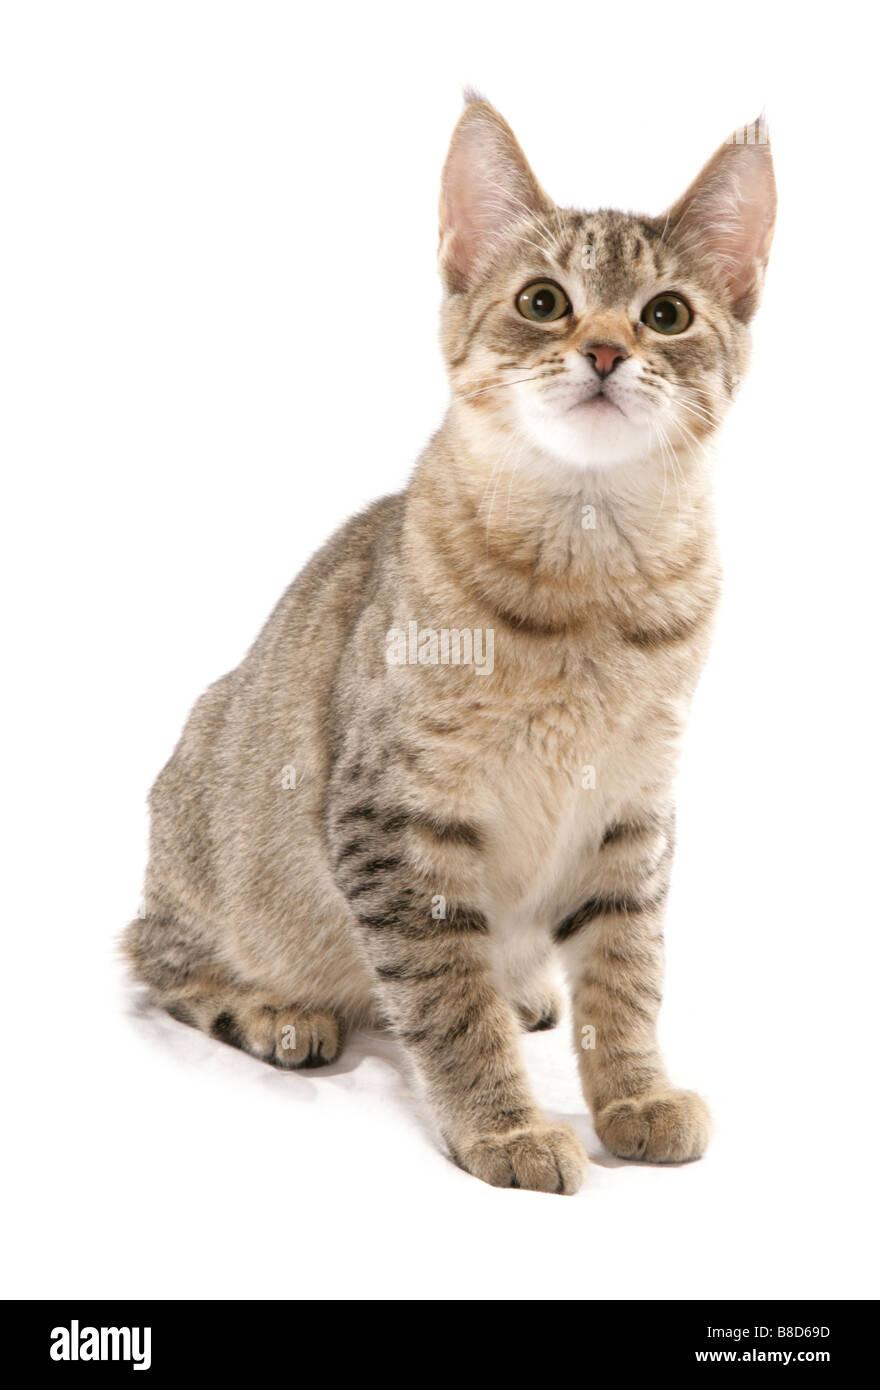 pixie bob cat sitting studio Stock Photo: 22417961 - Alamy